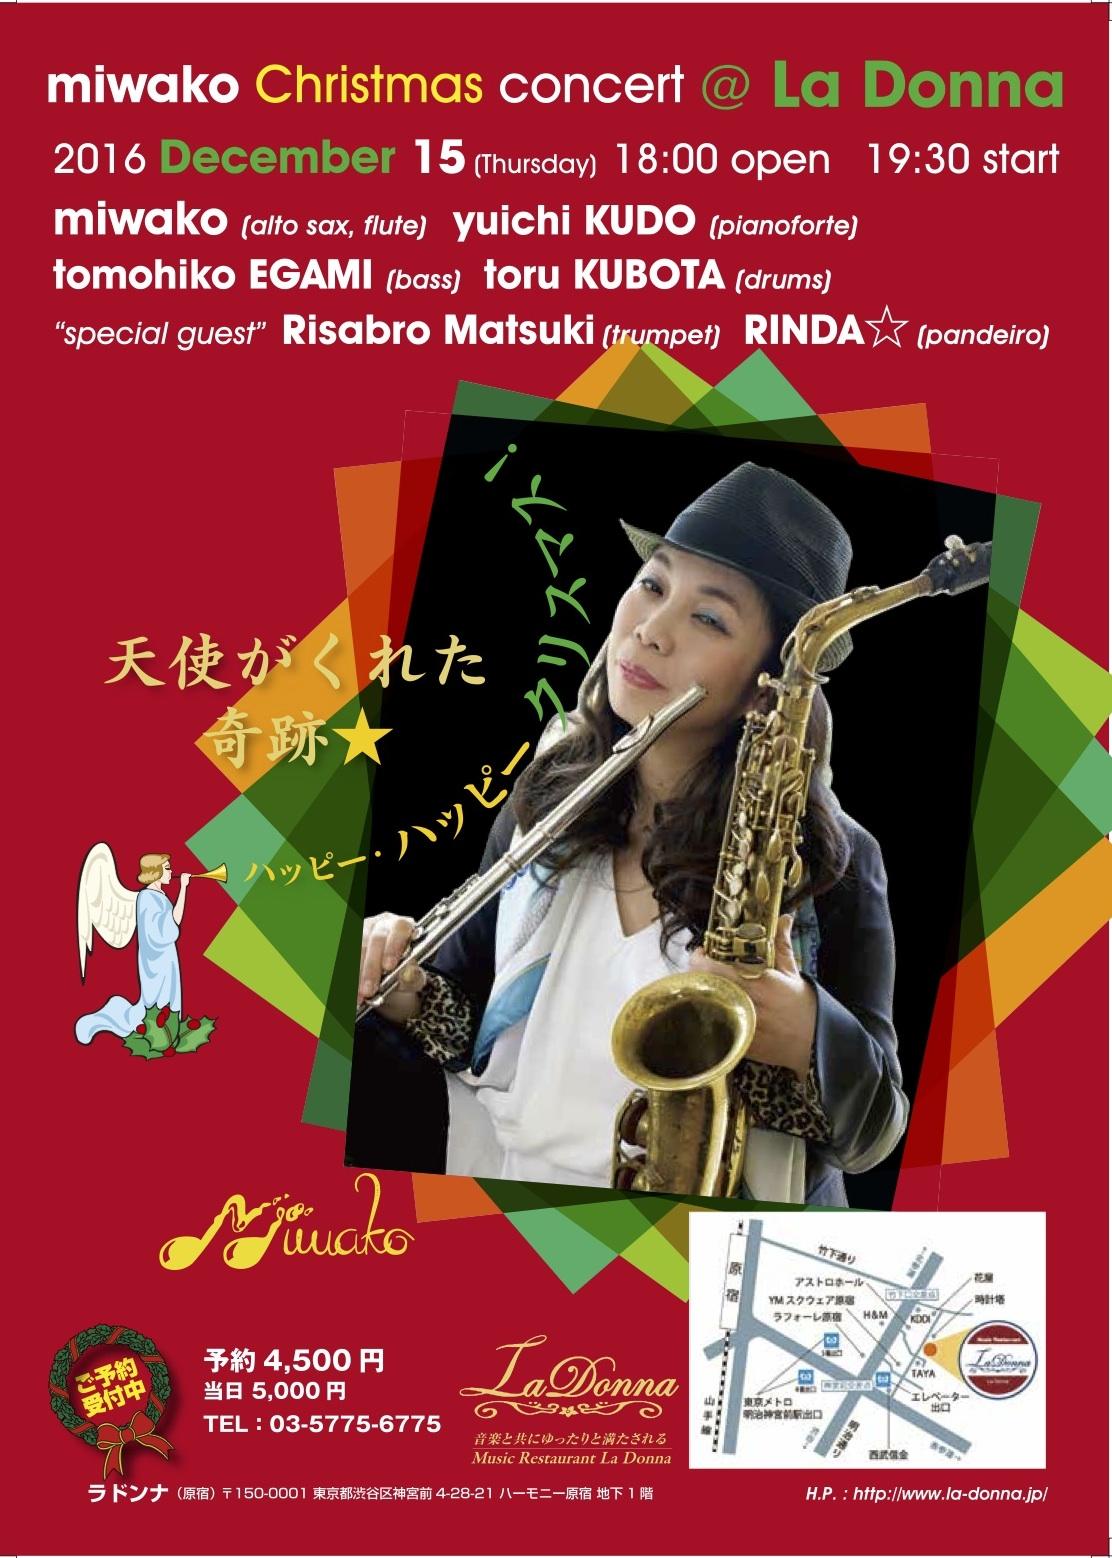 miwako Christmas concert @ La Donna 〜天使がくれた奇跡☆ハッピーハッピークリスマス!~